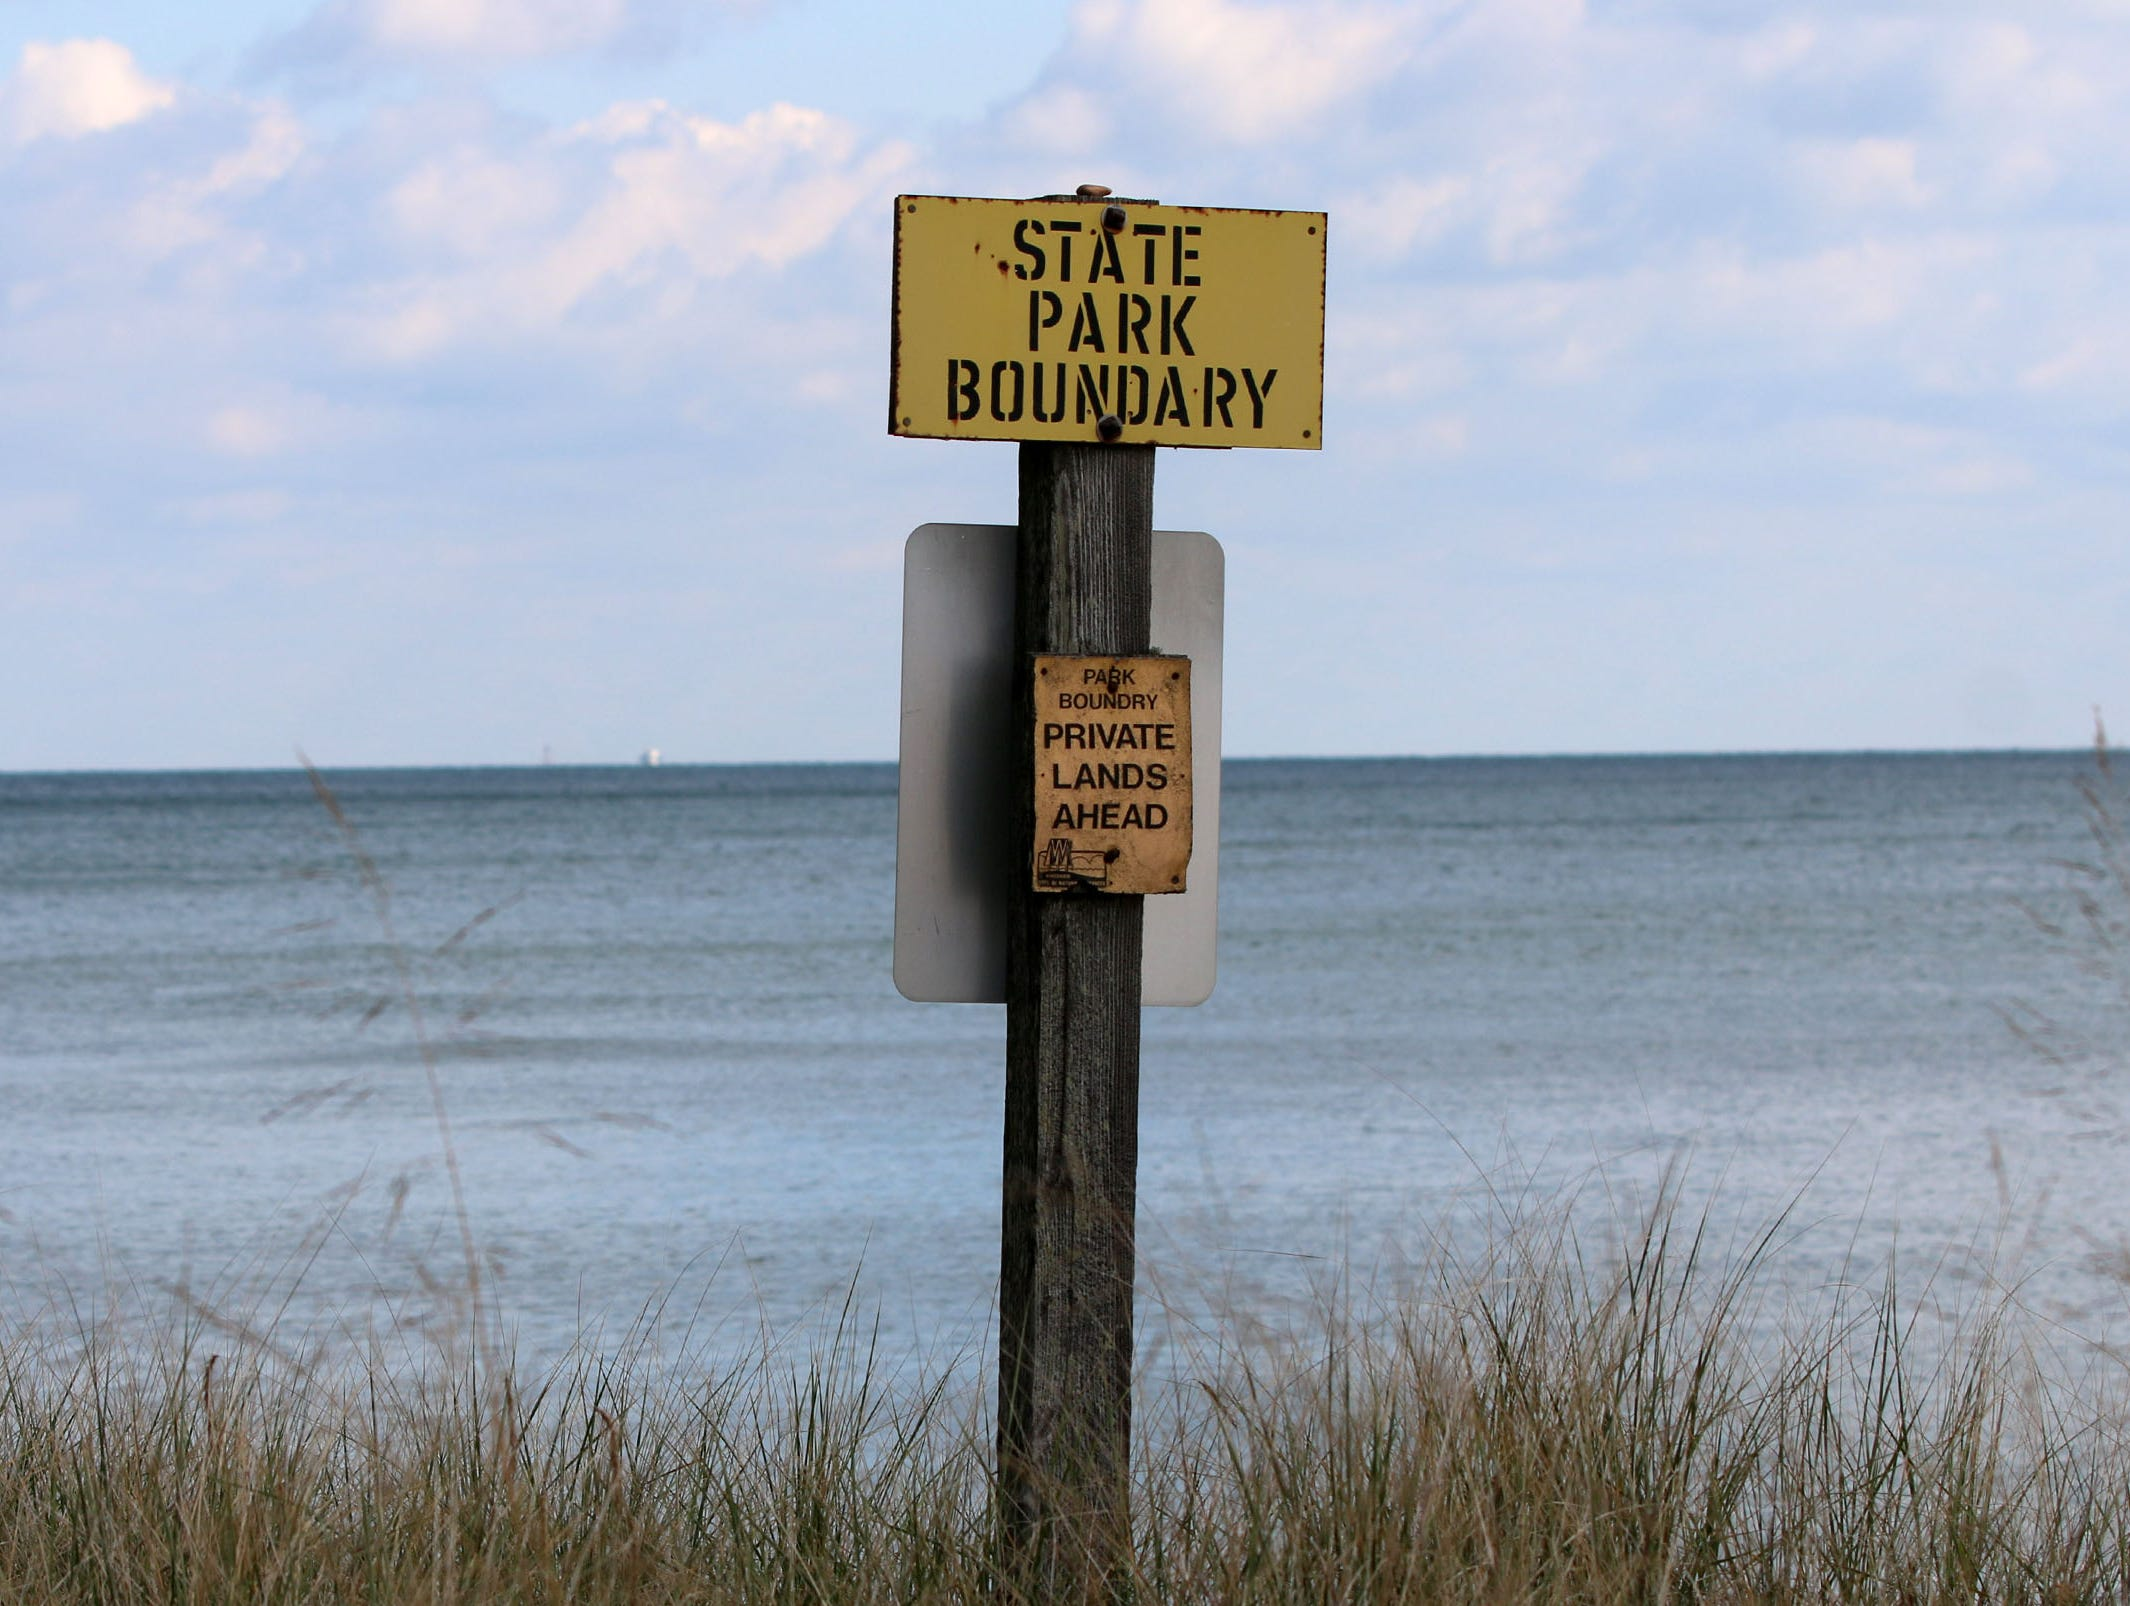 A sign marks where state park land ends and Kohler property begins on the north end of Kohler-Andrae Park, Wednesday September 26, 2018, in Sheboygan, Wis.